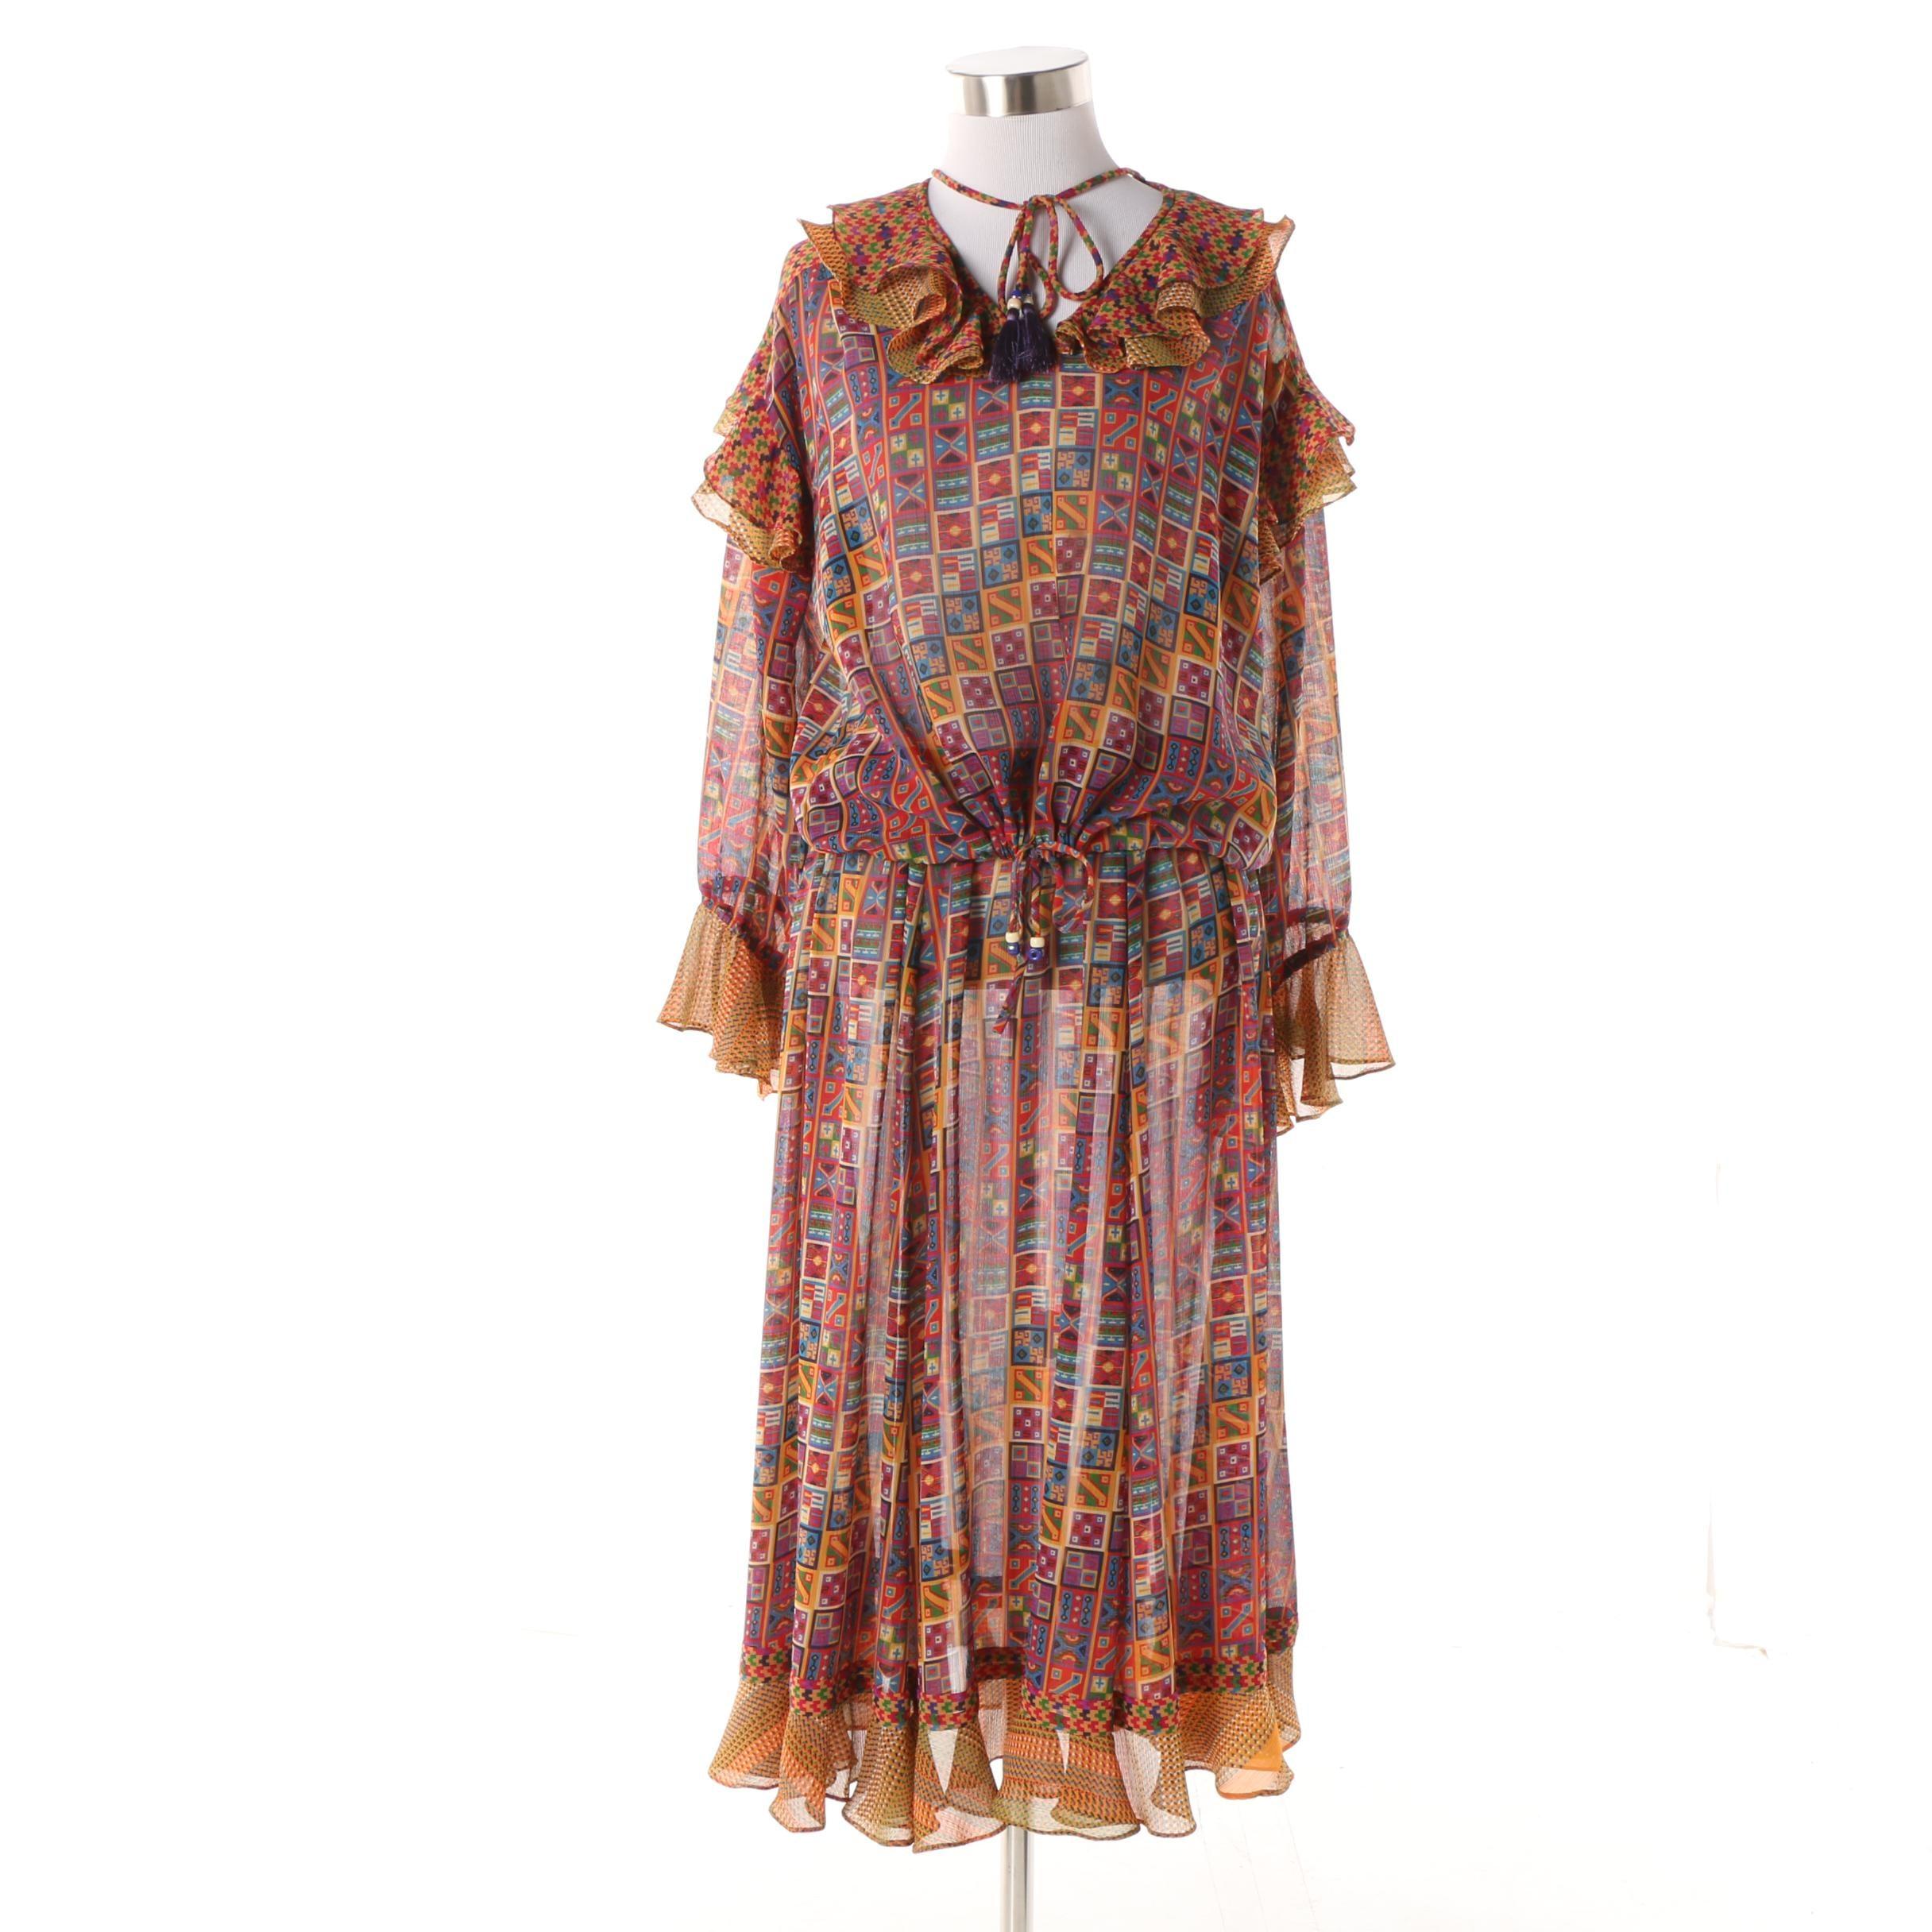 Vintage Diane Fres Geometric Print Skirt Set with Ruffled Trim